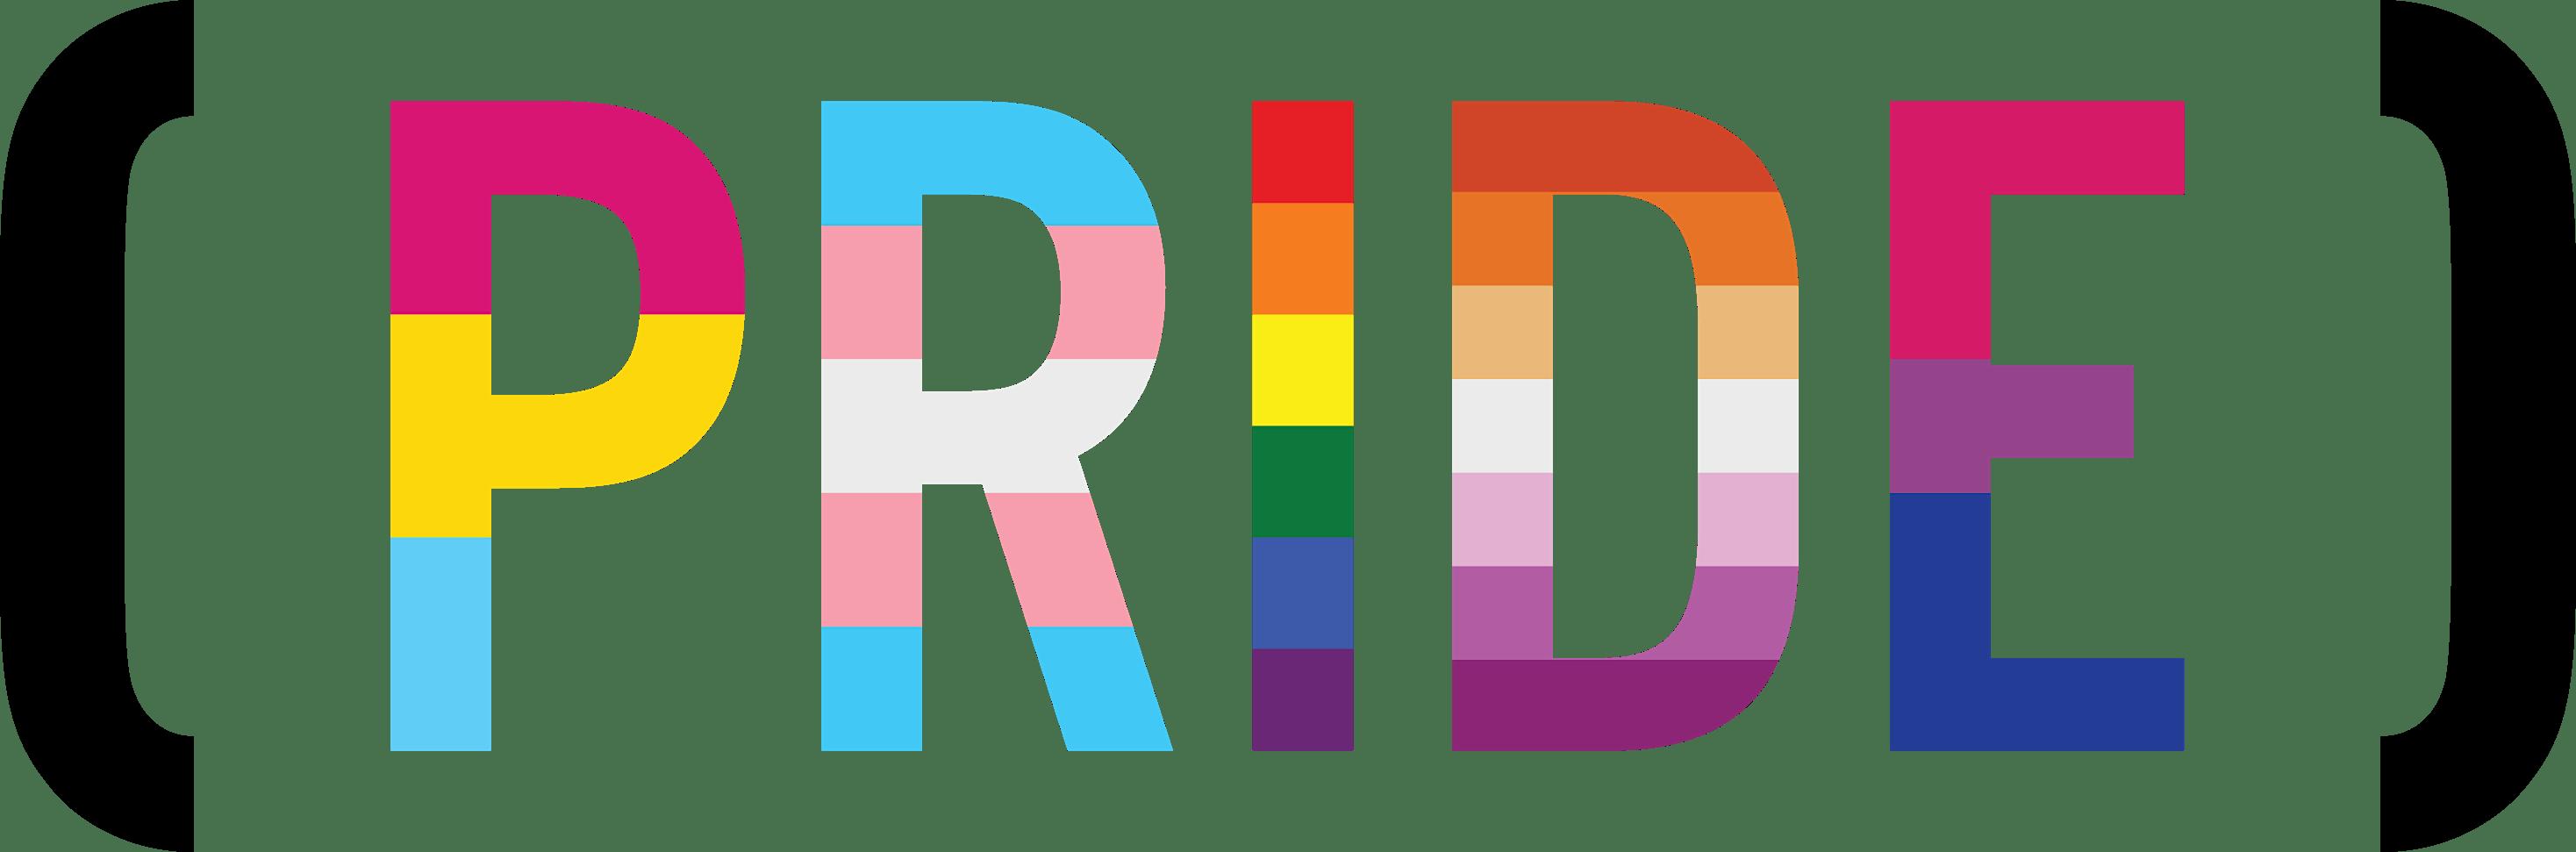 SUN, JUN 27 - SUNDAY FUNDAY: PRIDE EDITION